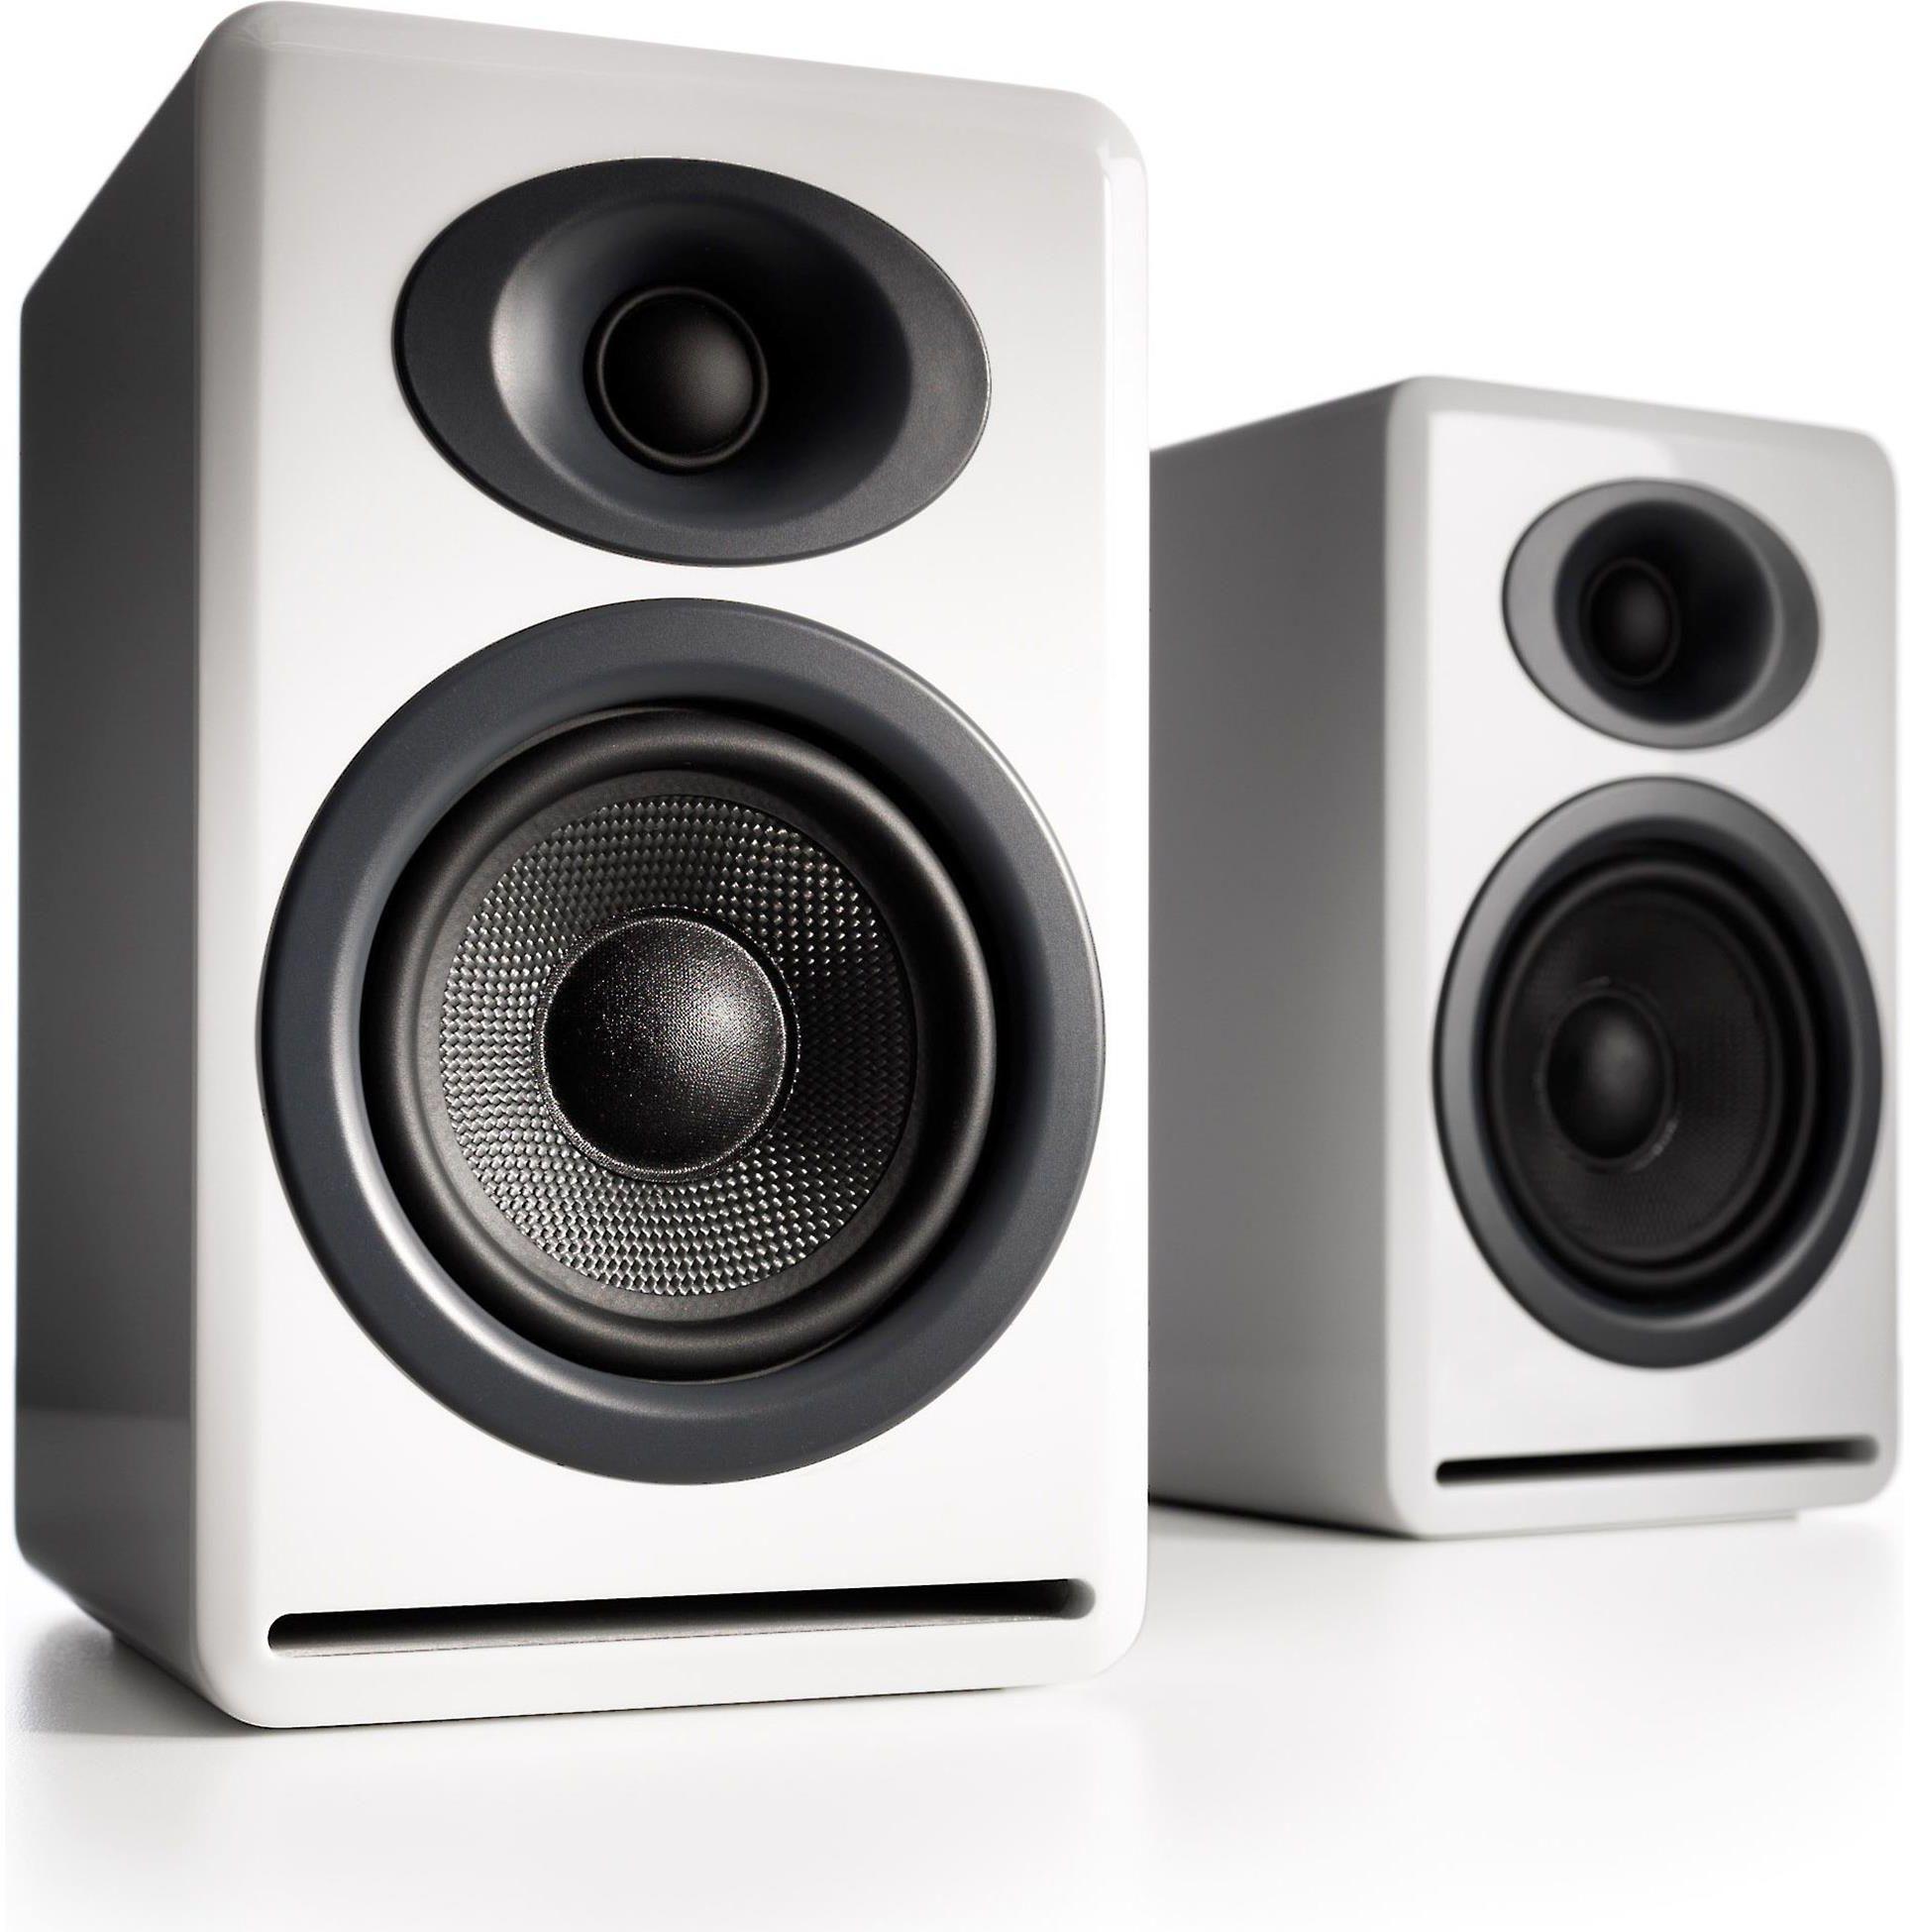 Speakers Home Entertainment Hdtvs Automation West Allis Wi Audioengine Hd6 Cherry Audio Engine 55 Passive Bookshelf P4 White